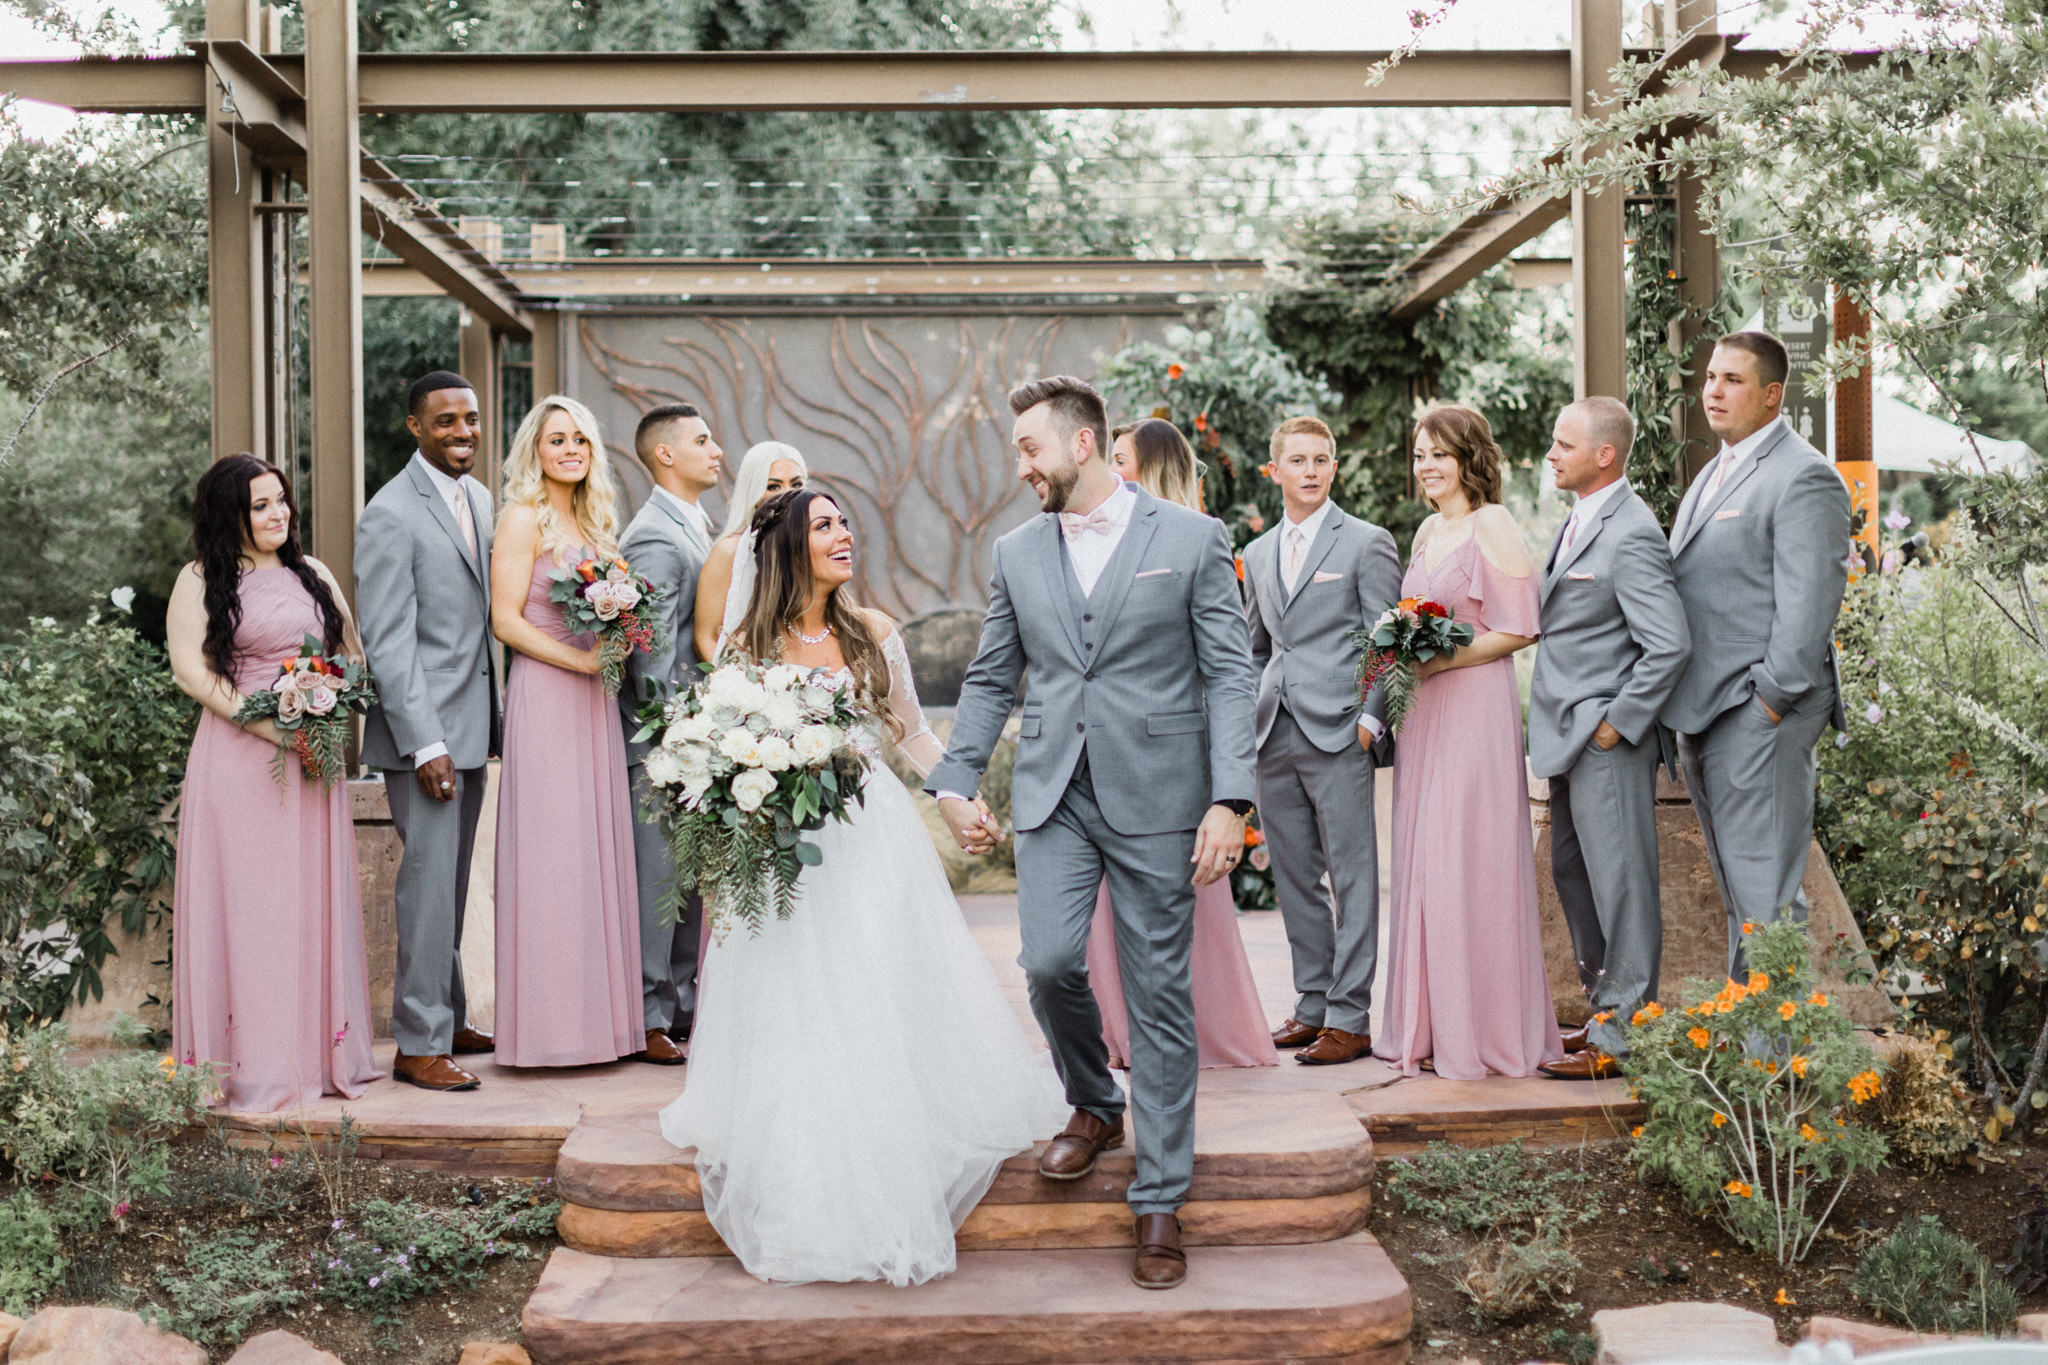 Springs-Preserve-Las-Vegas-Wedding-Photographer-100.jpg